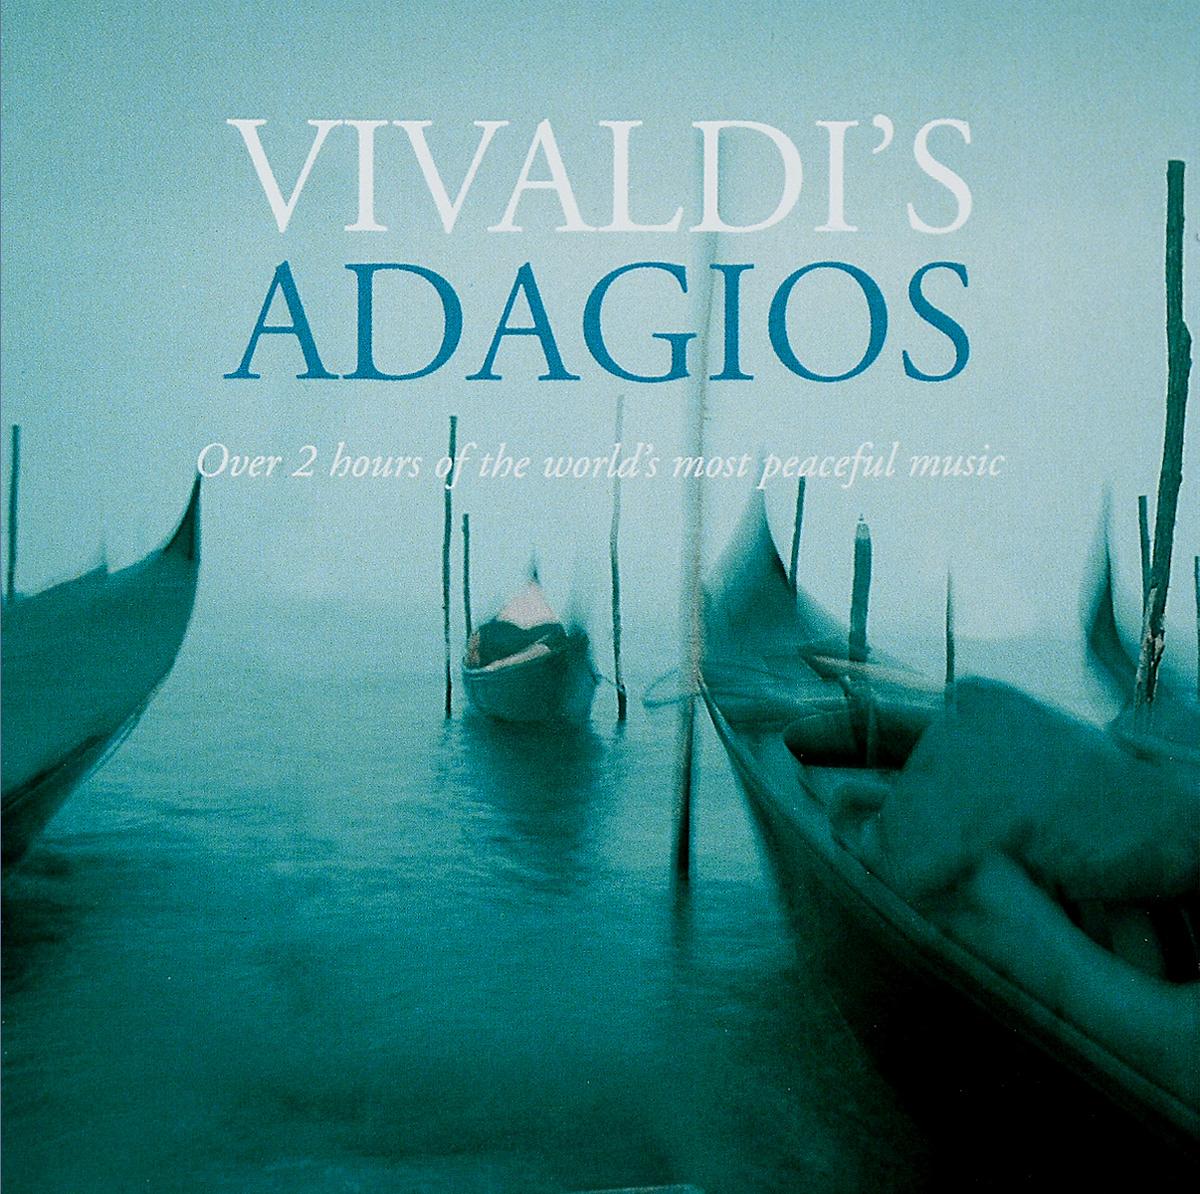 Vivaldi Adagios (2 CD) 101 vivaldi 6 cd